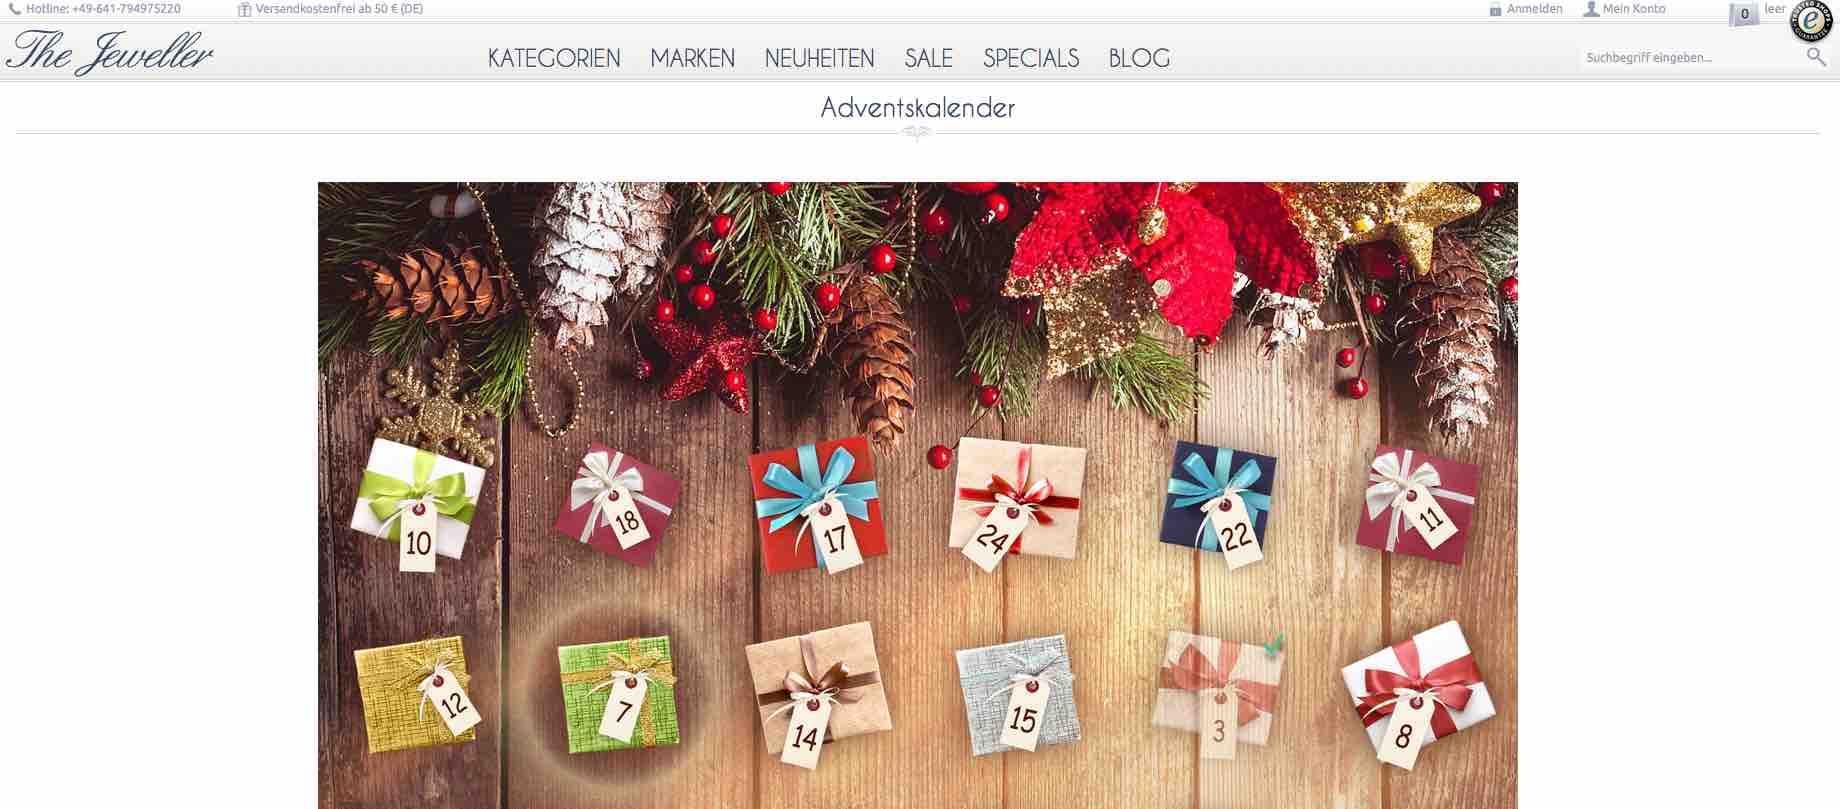 the jeweller daily christmas gifts adventskalender online. Black Bedroom Furniture Sets. Home Design Ideas